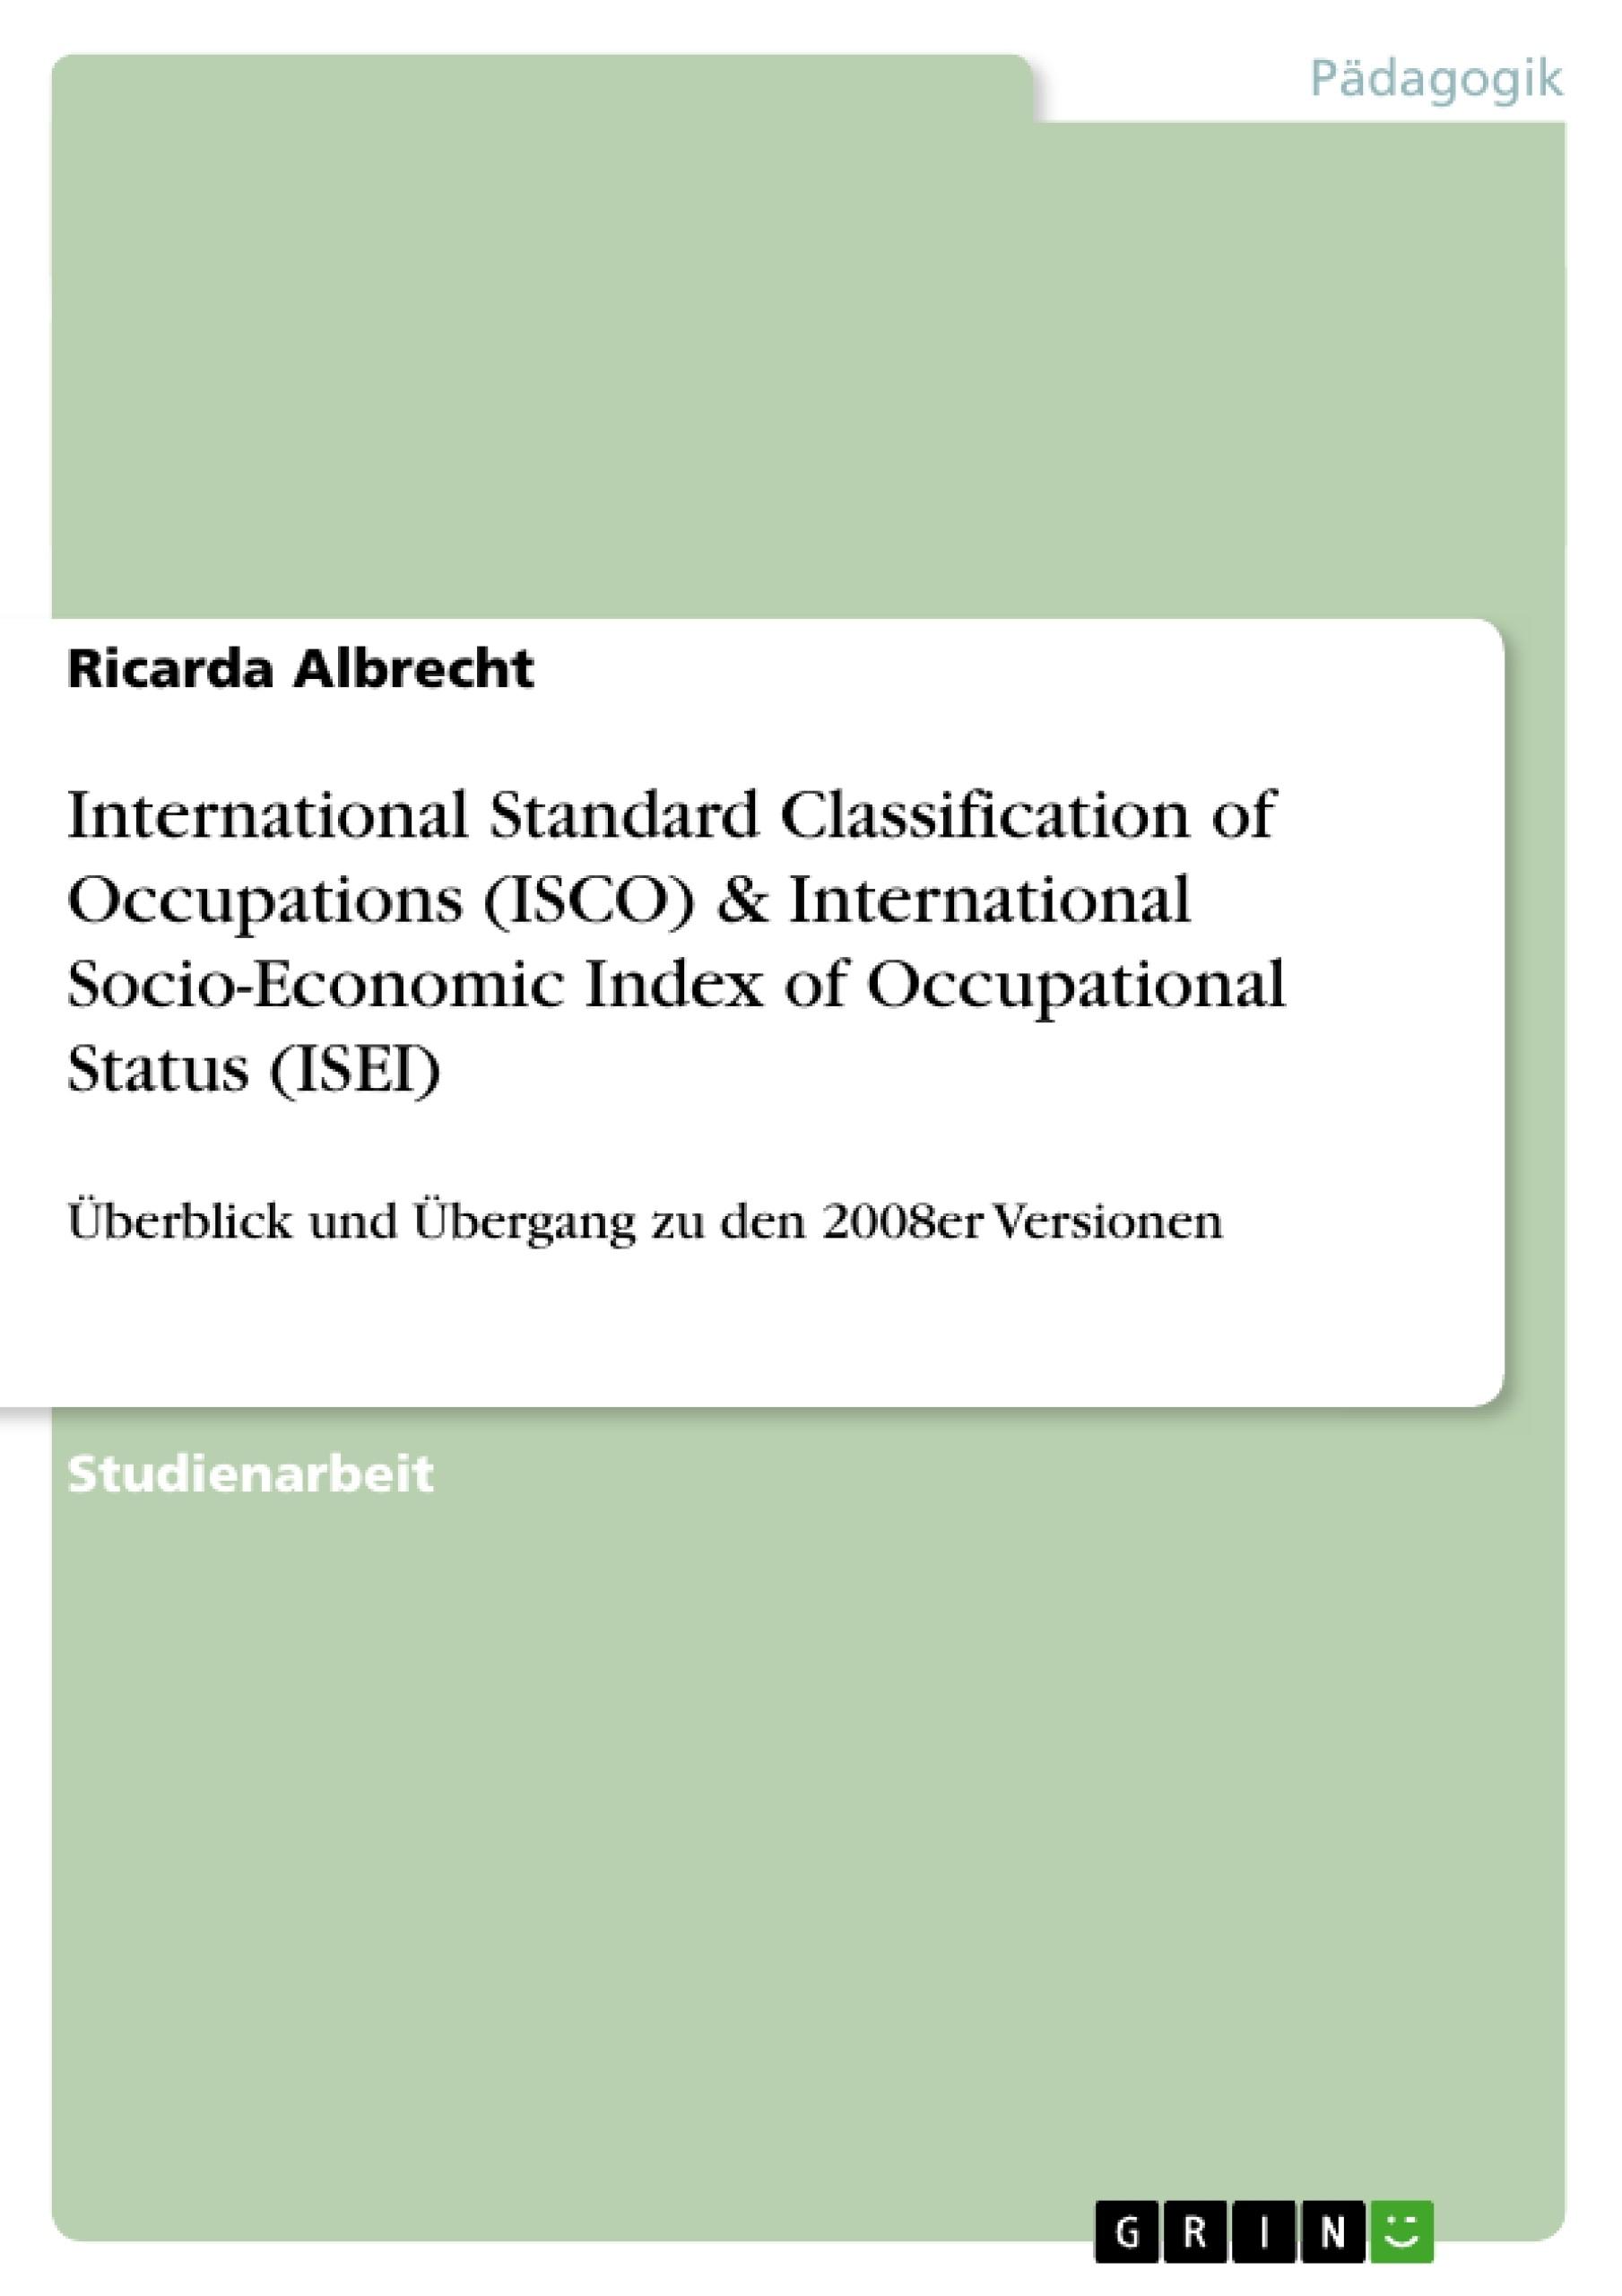 Titel: International Standard Classification of Occupations (ISCO) & International Socio-Economic Index of Occupational Status (ISEI)